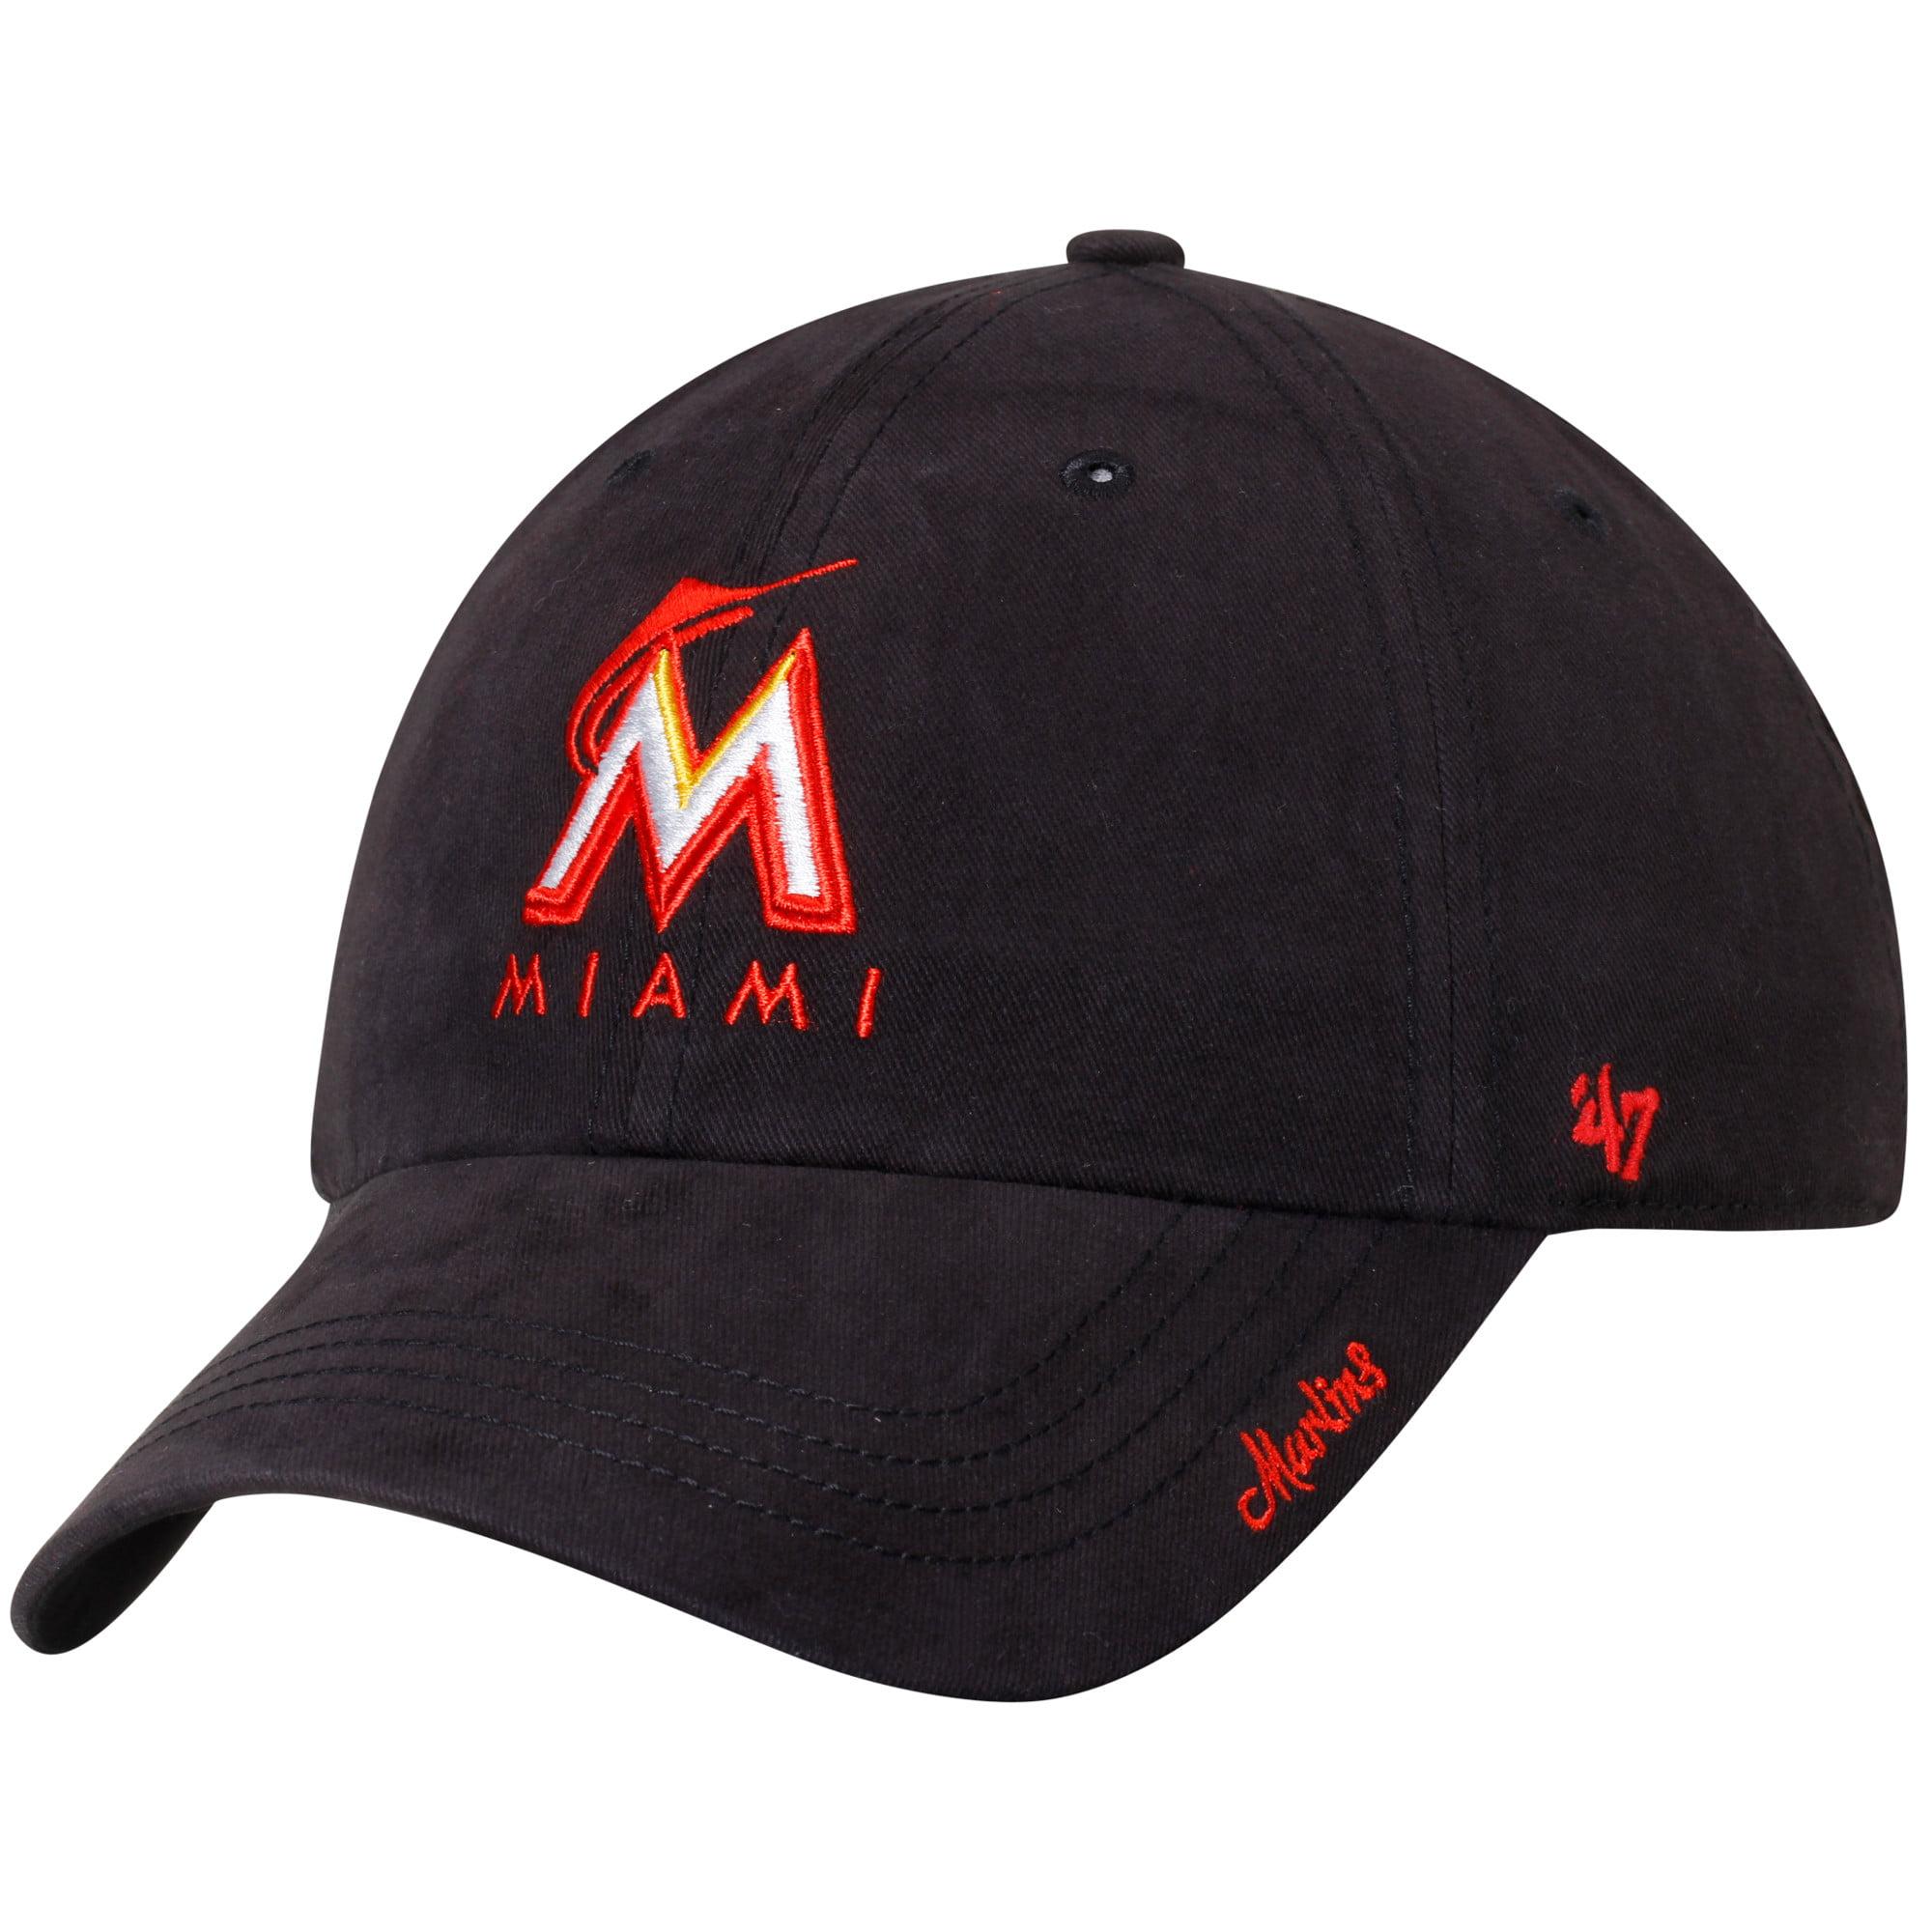 Miami Marlins '47 Women's Miata Clean Up Adjustable Hat - Black - OSFA